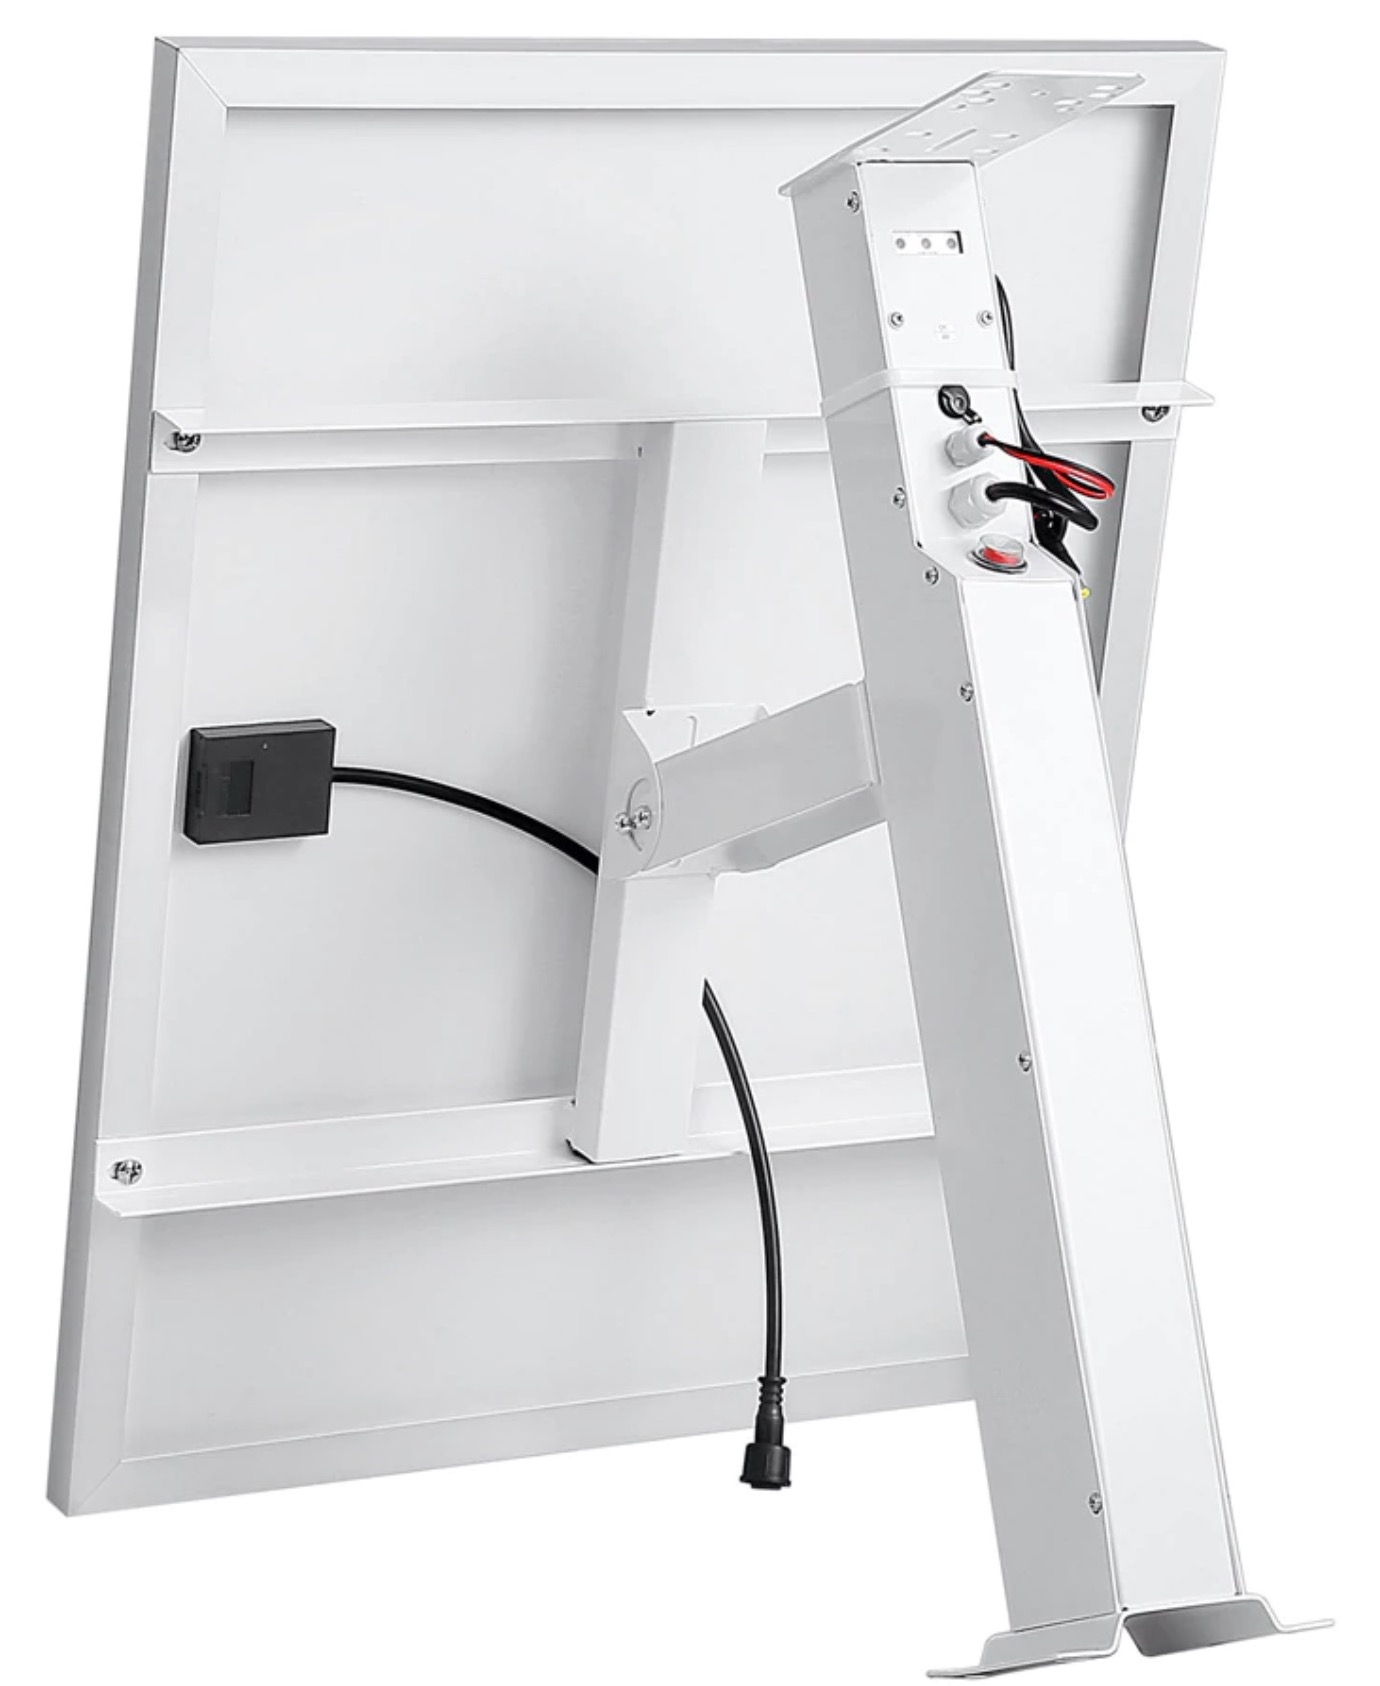 Bracket with Solar Panel & Batteries - bottom